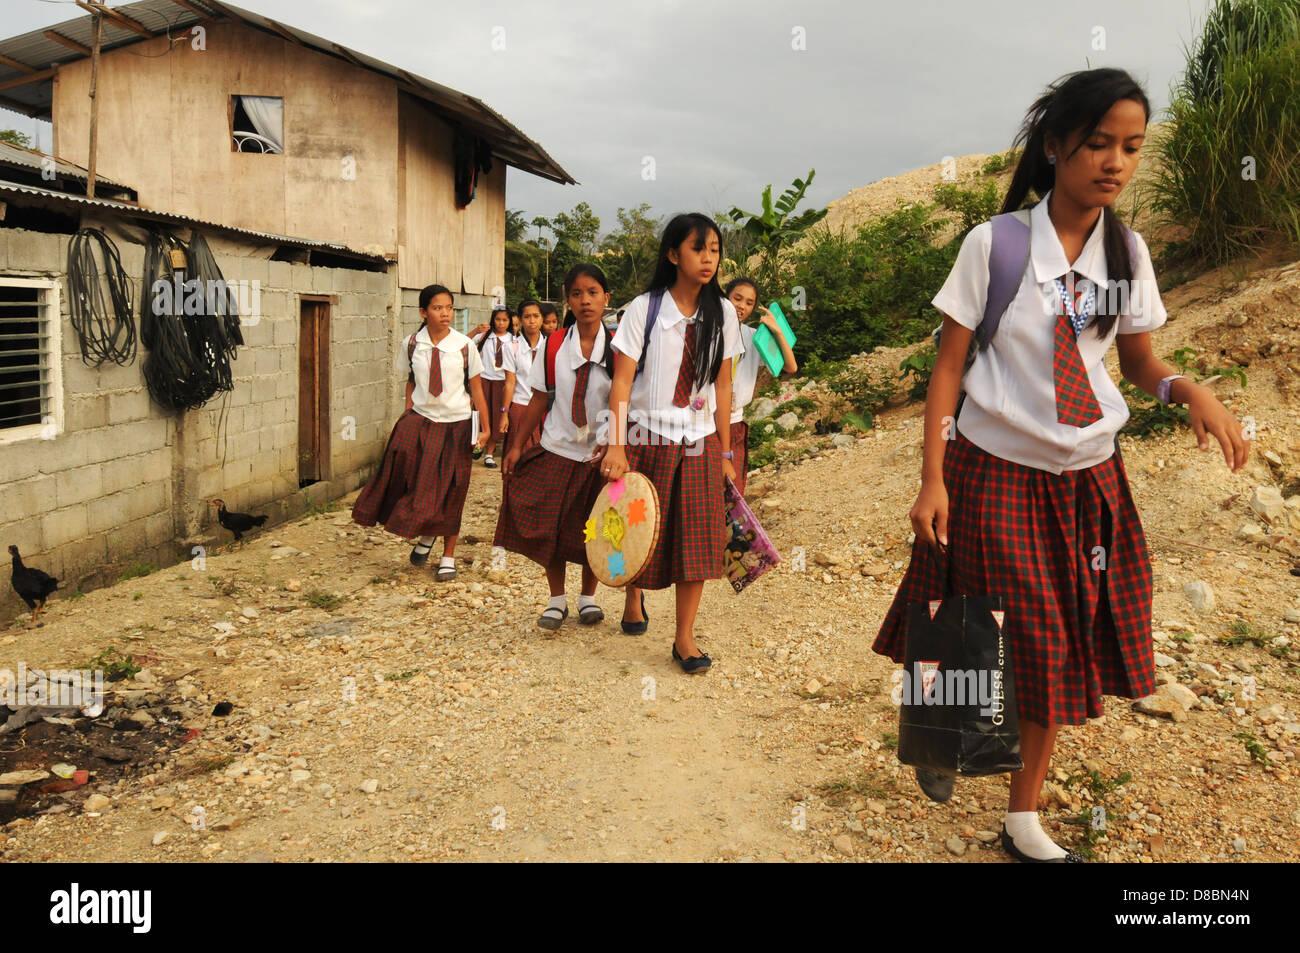 Filipino schoolchildren walk along the street in the coastal town of Puerto Galera. Mindoro Island, Philippines - Stock Image